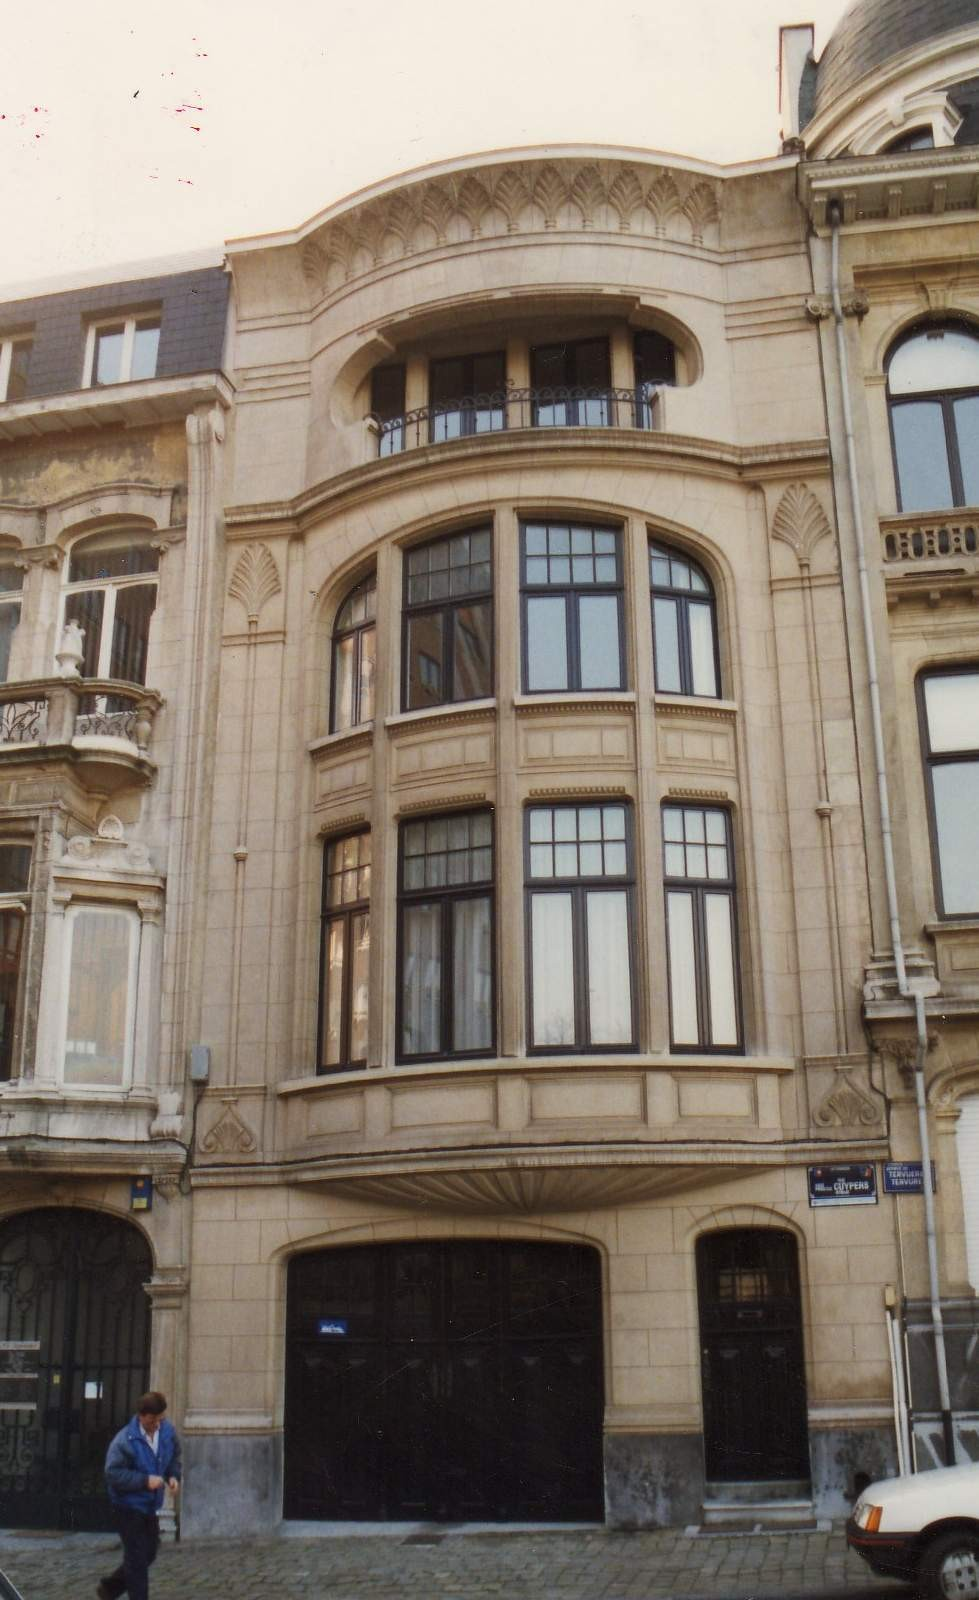 Rue Abbé Cuypers 1., 1993